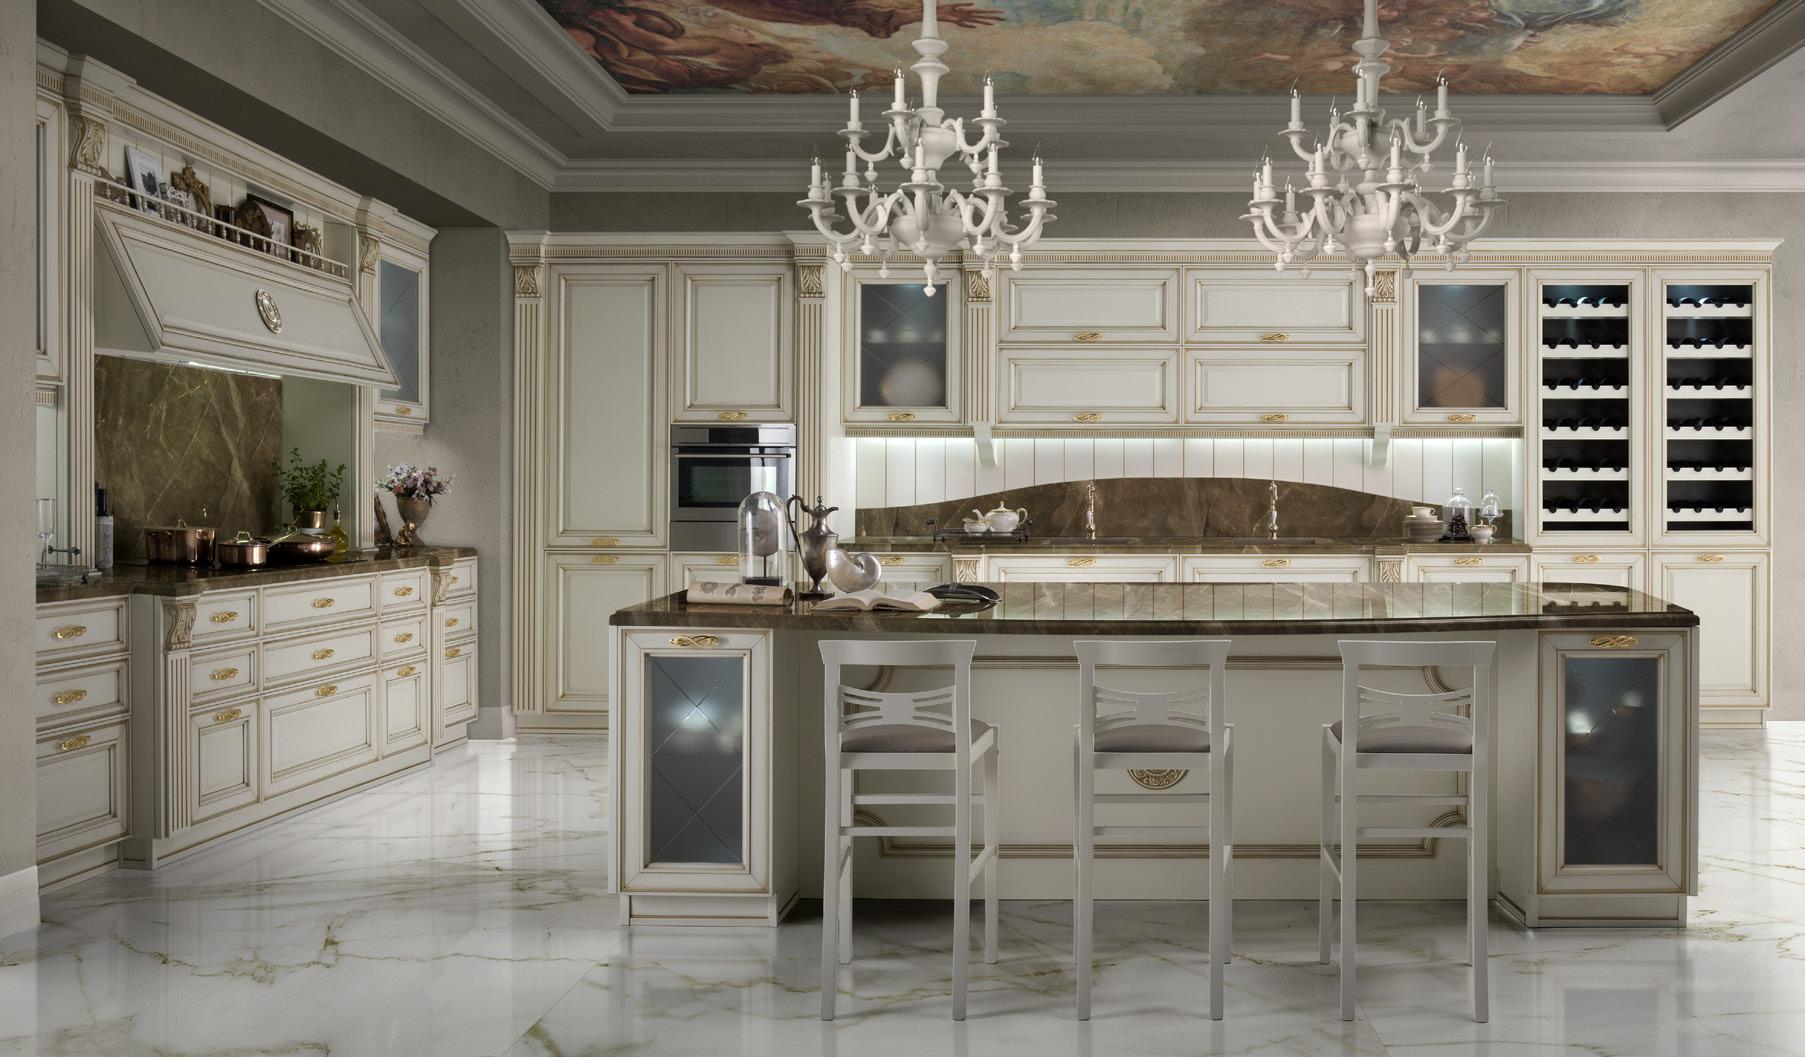 Caviar miton cucine - Miton cucine forum ...